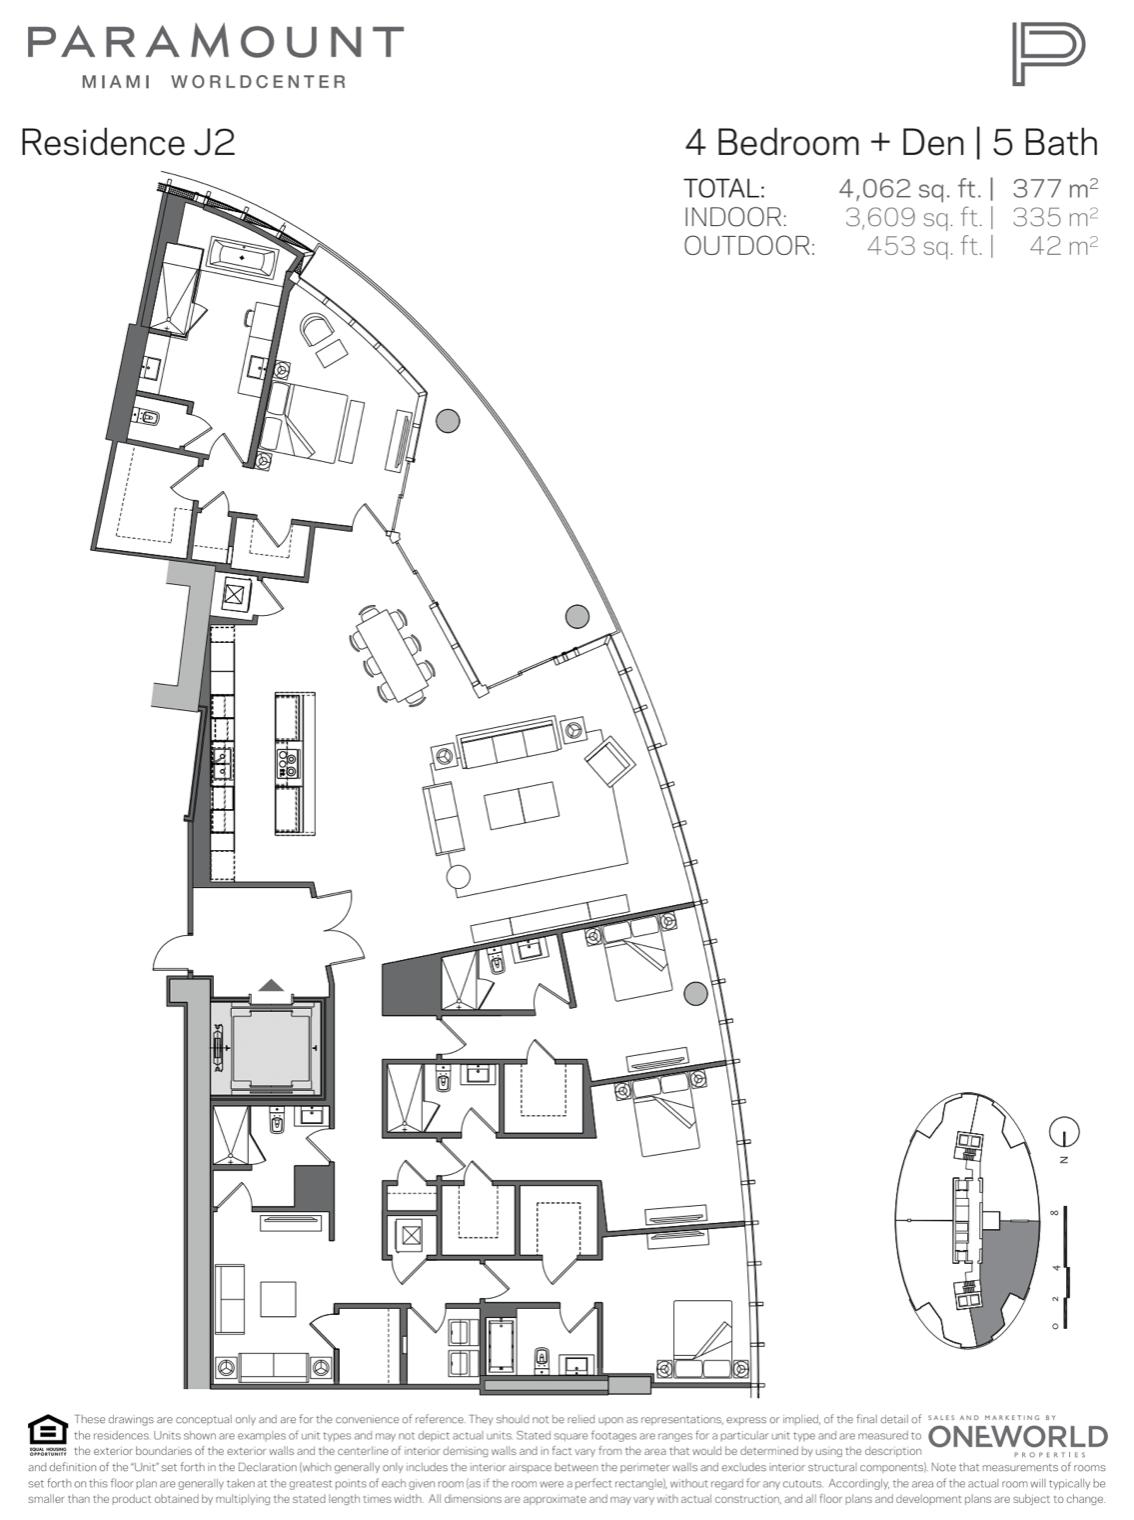 PMWC Penthouse J2